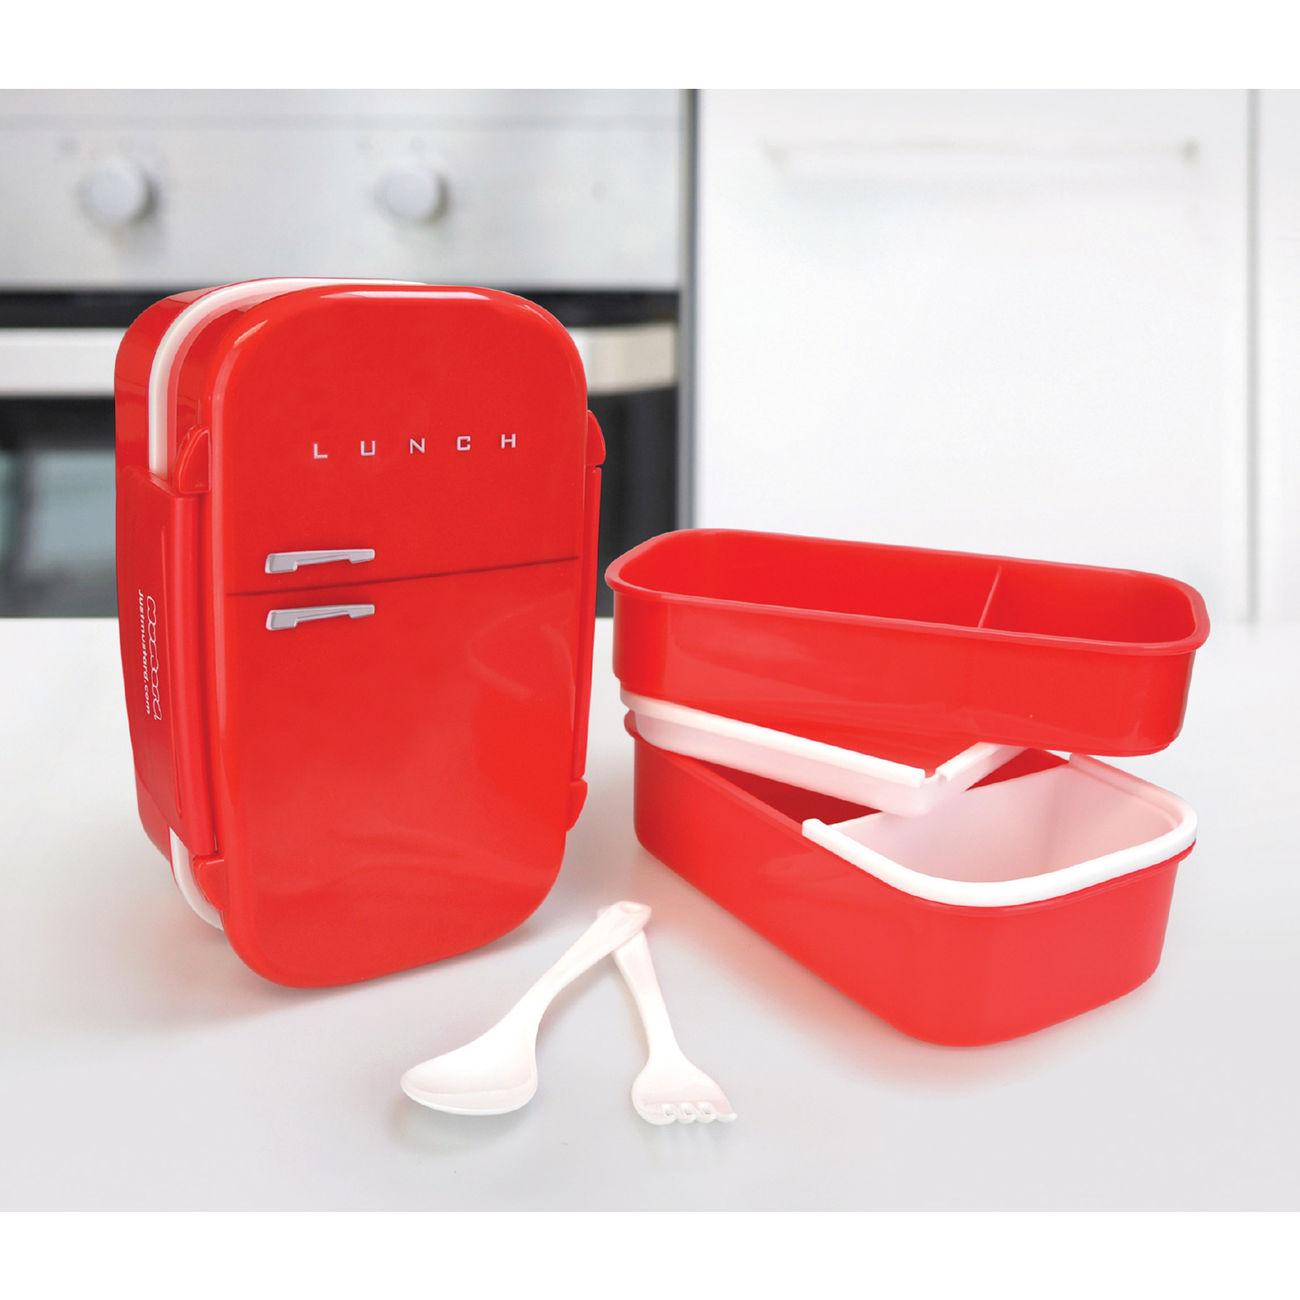 mustard lunch box retro k hlschrank rot g nstig kaufen kotte zeller. Black Bedroom Furniture Sets. Home Design Ideas